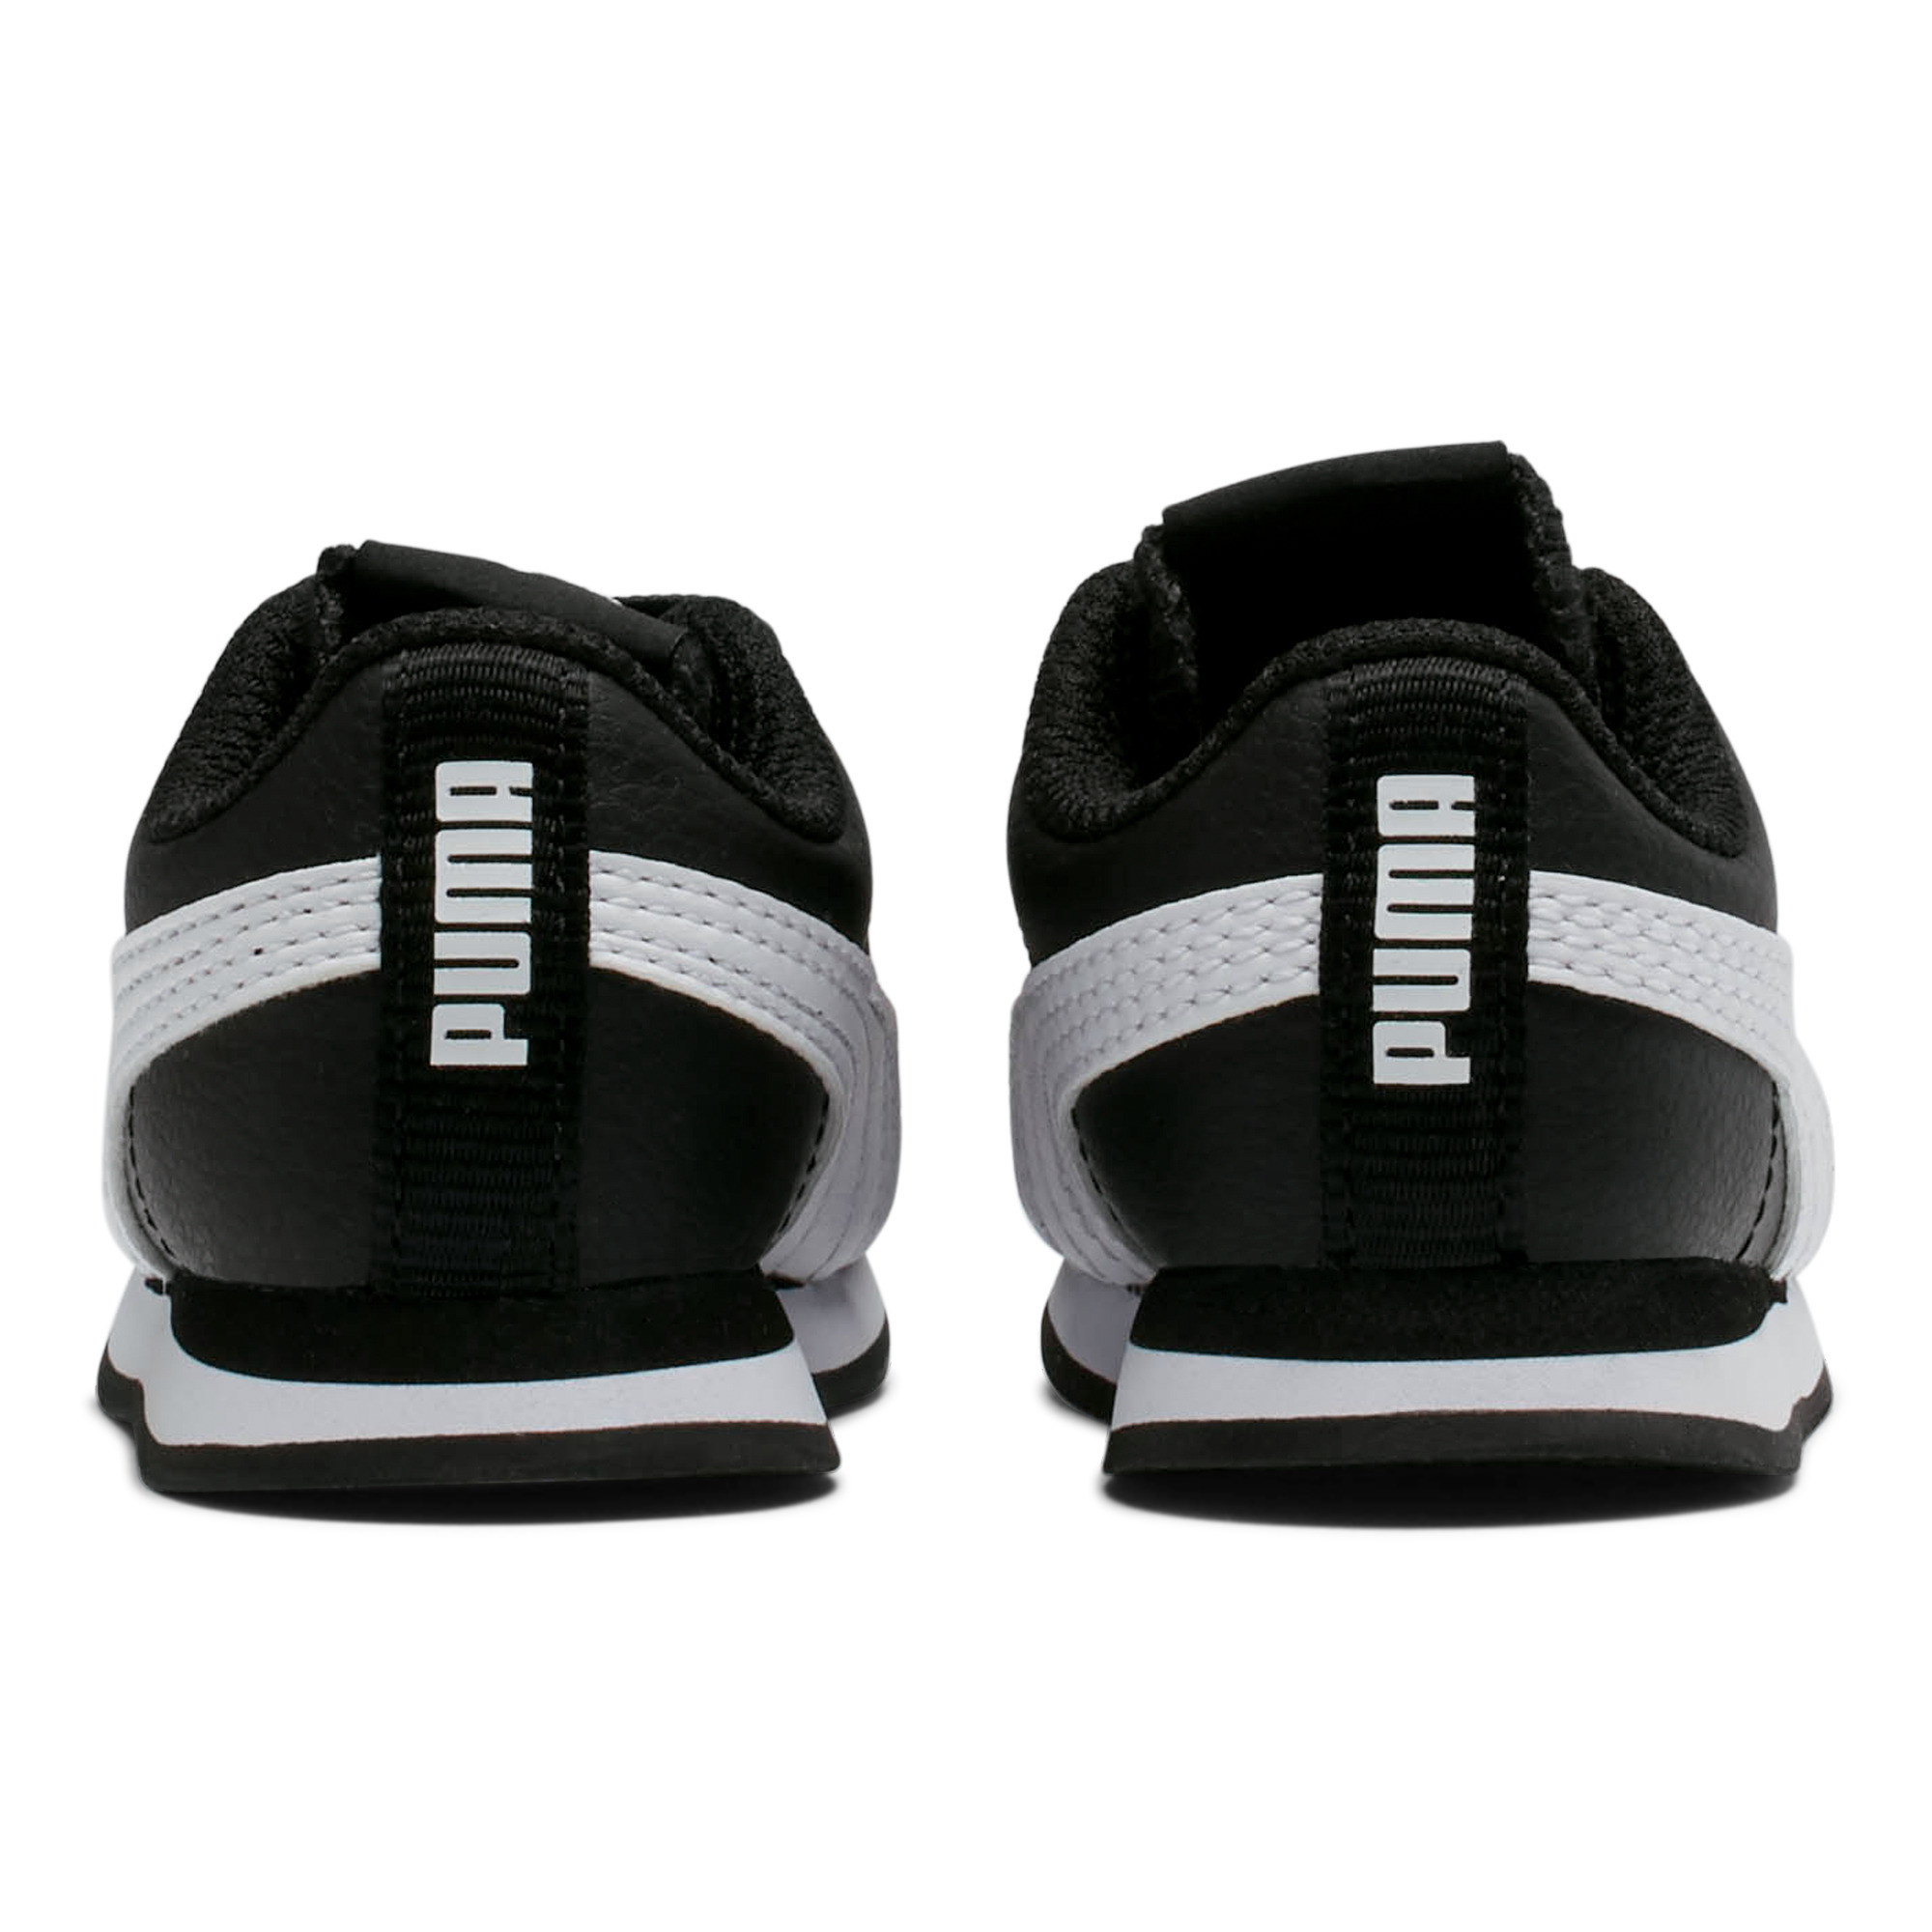 PUMA-Turin-II-AC-Toddler-Shoes-Unisex-Shoe-Kids thumbnail 8